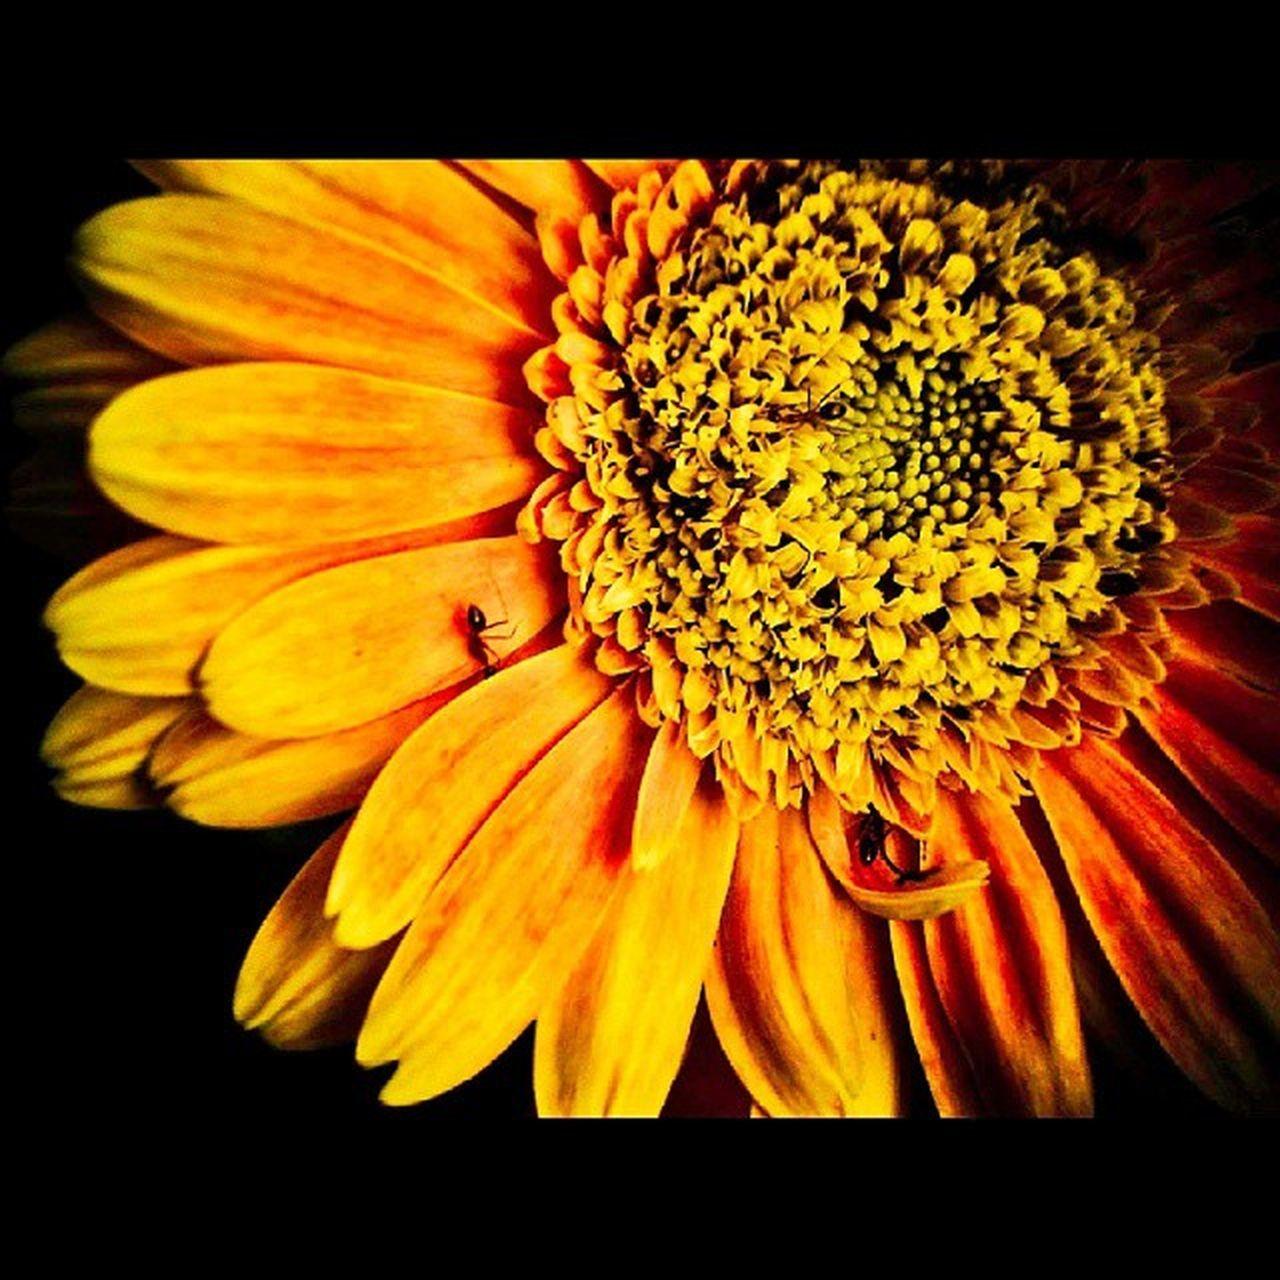 Itsyellow Bloom Flower Yellow Ants Waiting Superblybored Yetanotheroldclick EyeEmNewHere